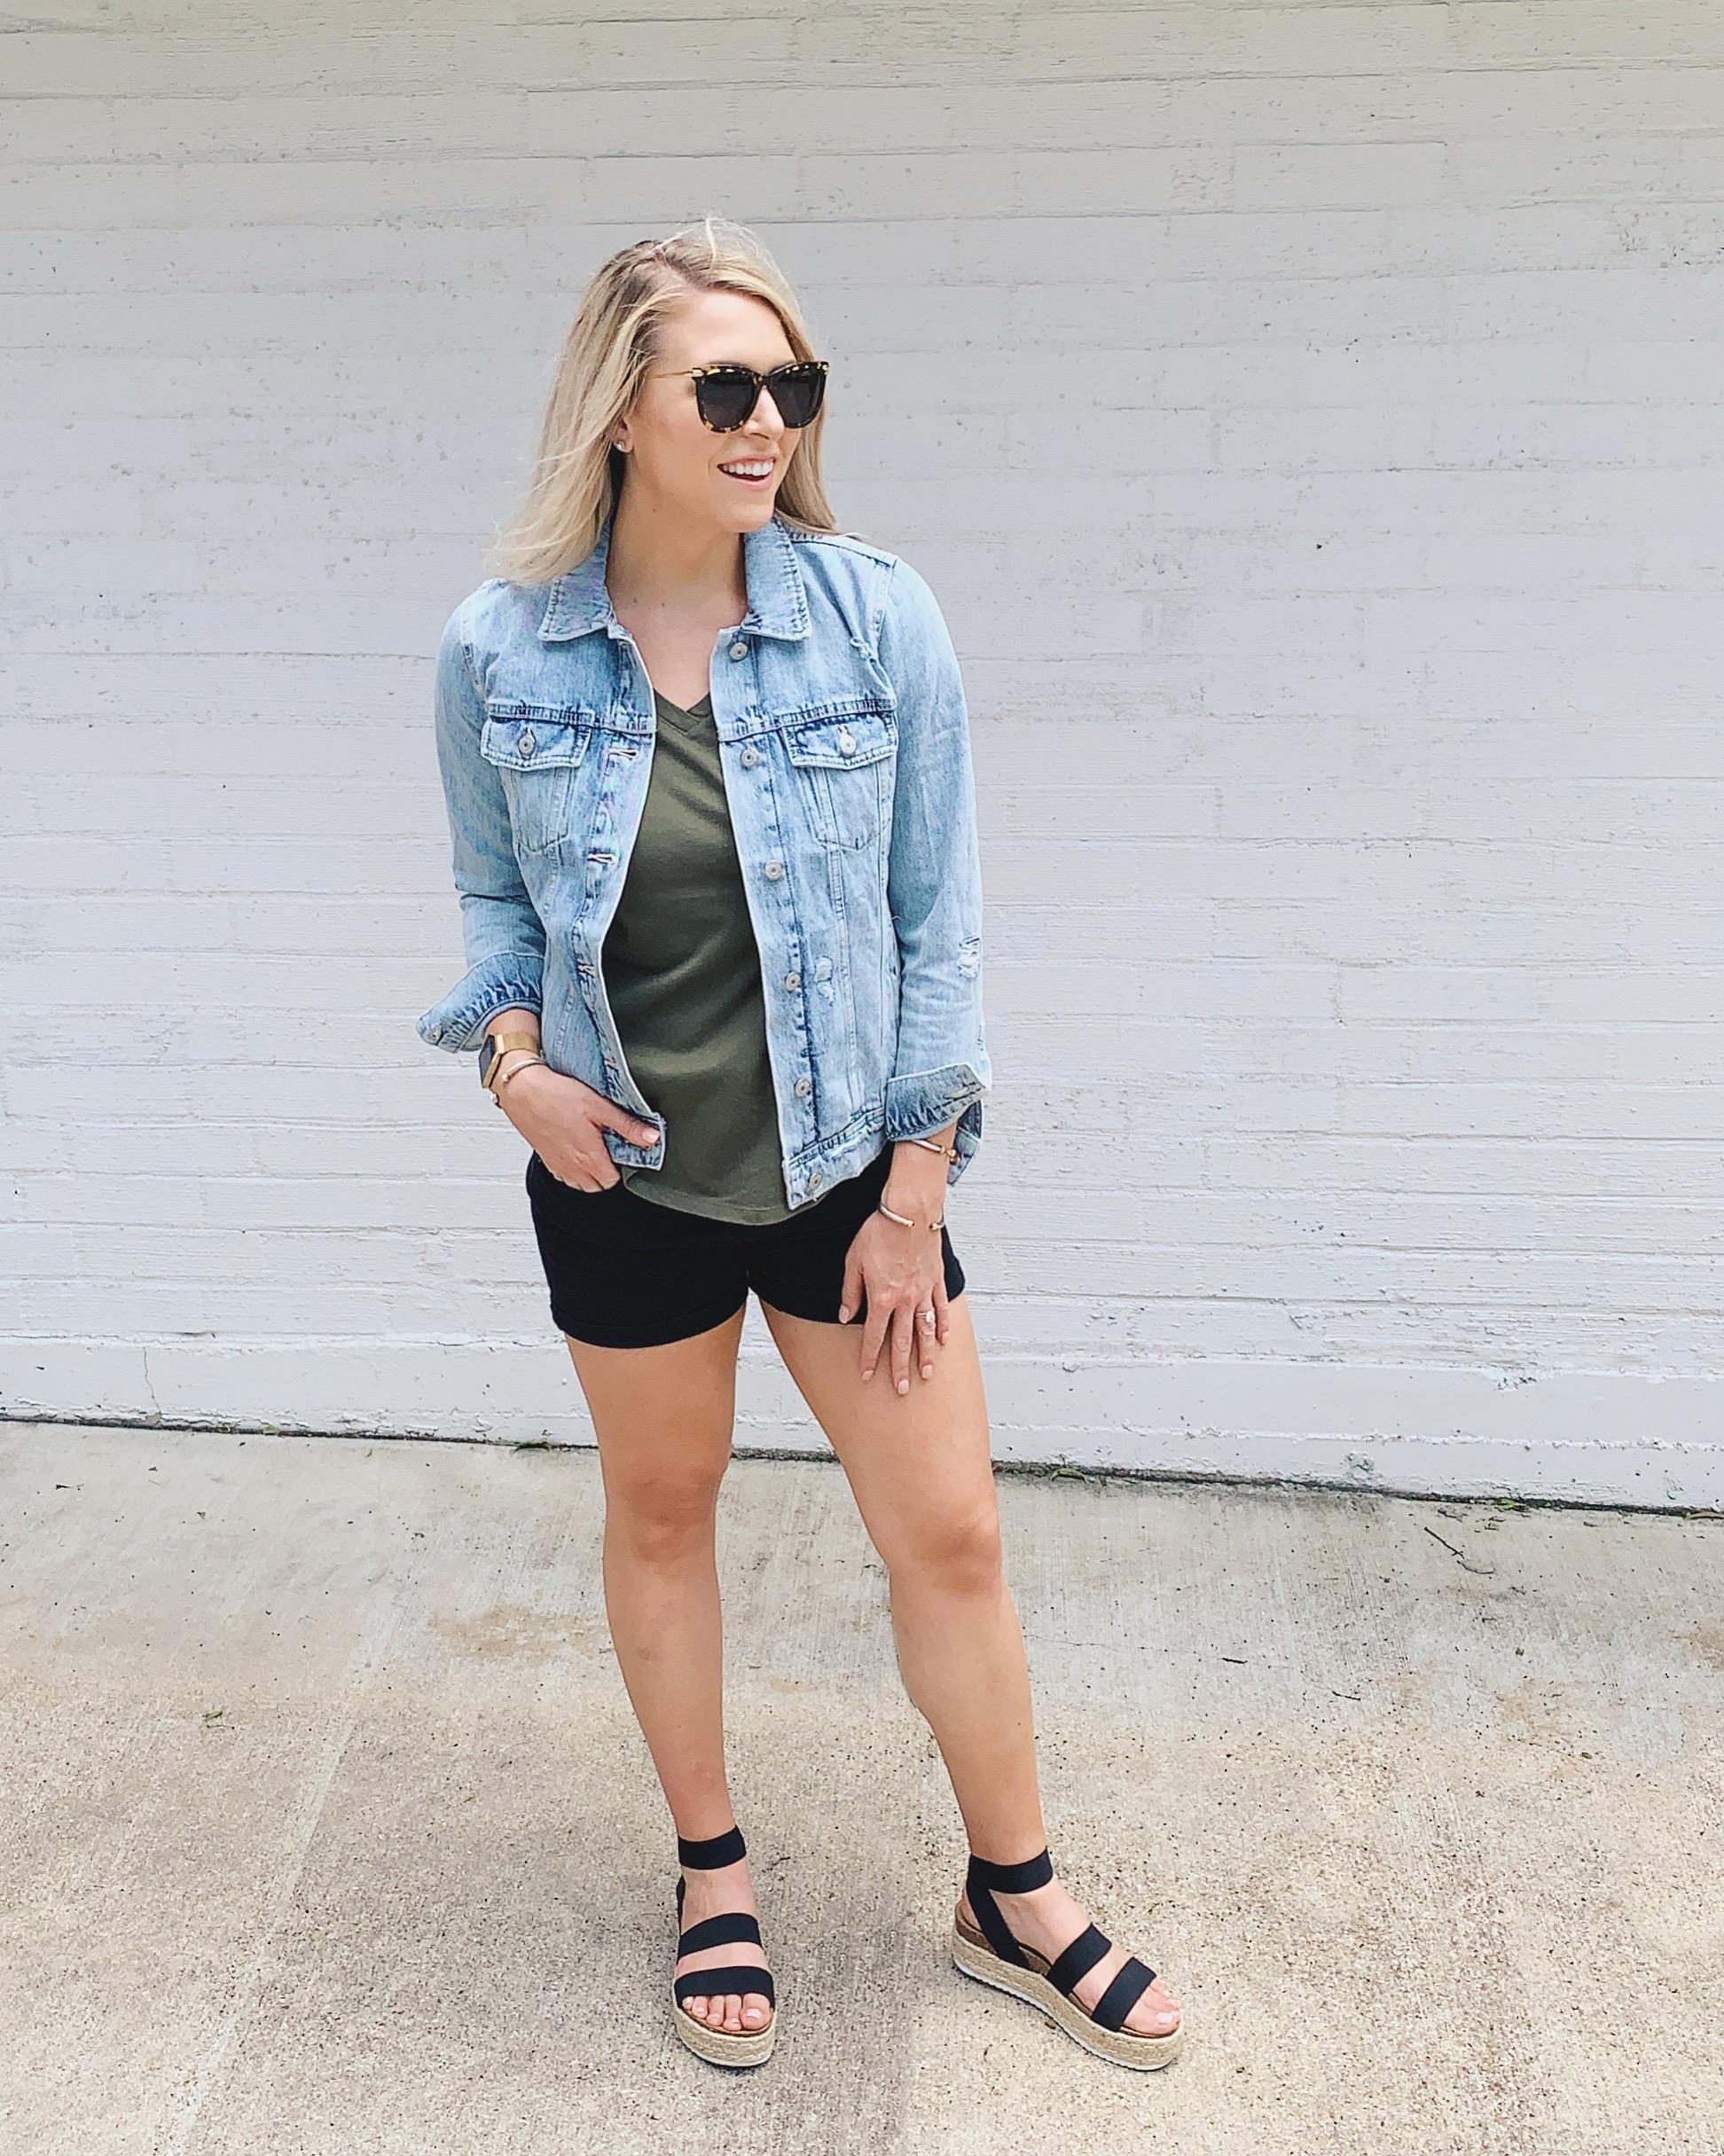 Mallory-Ming-Ennis-jean-jacket-style-summer-1